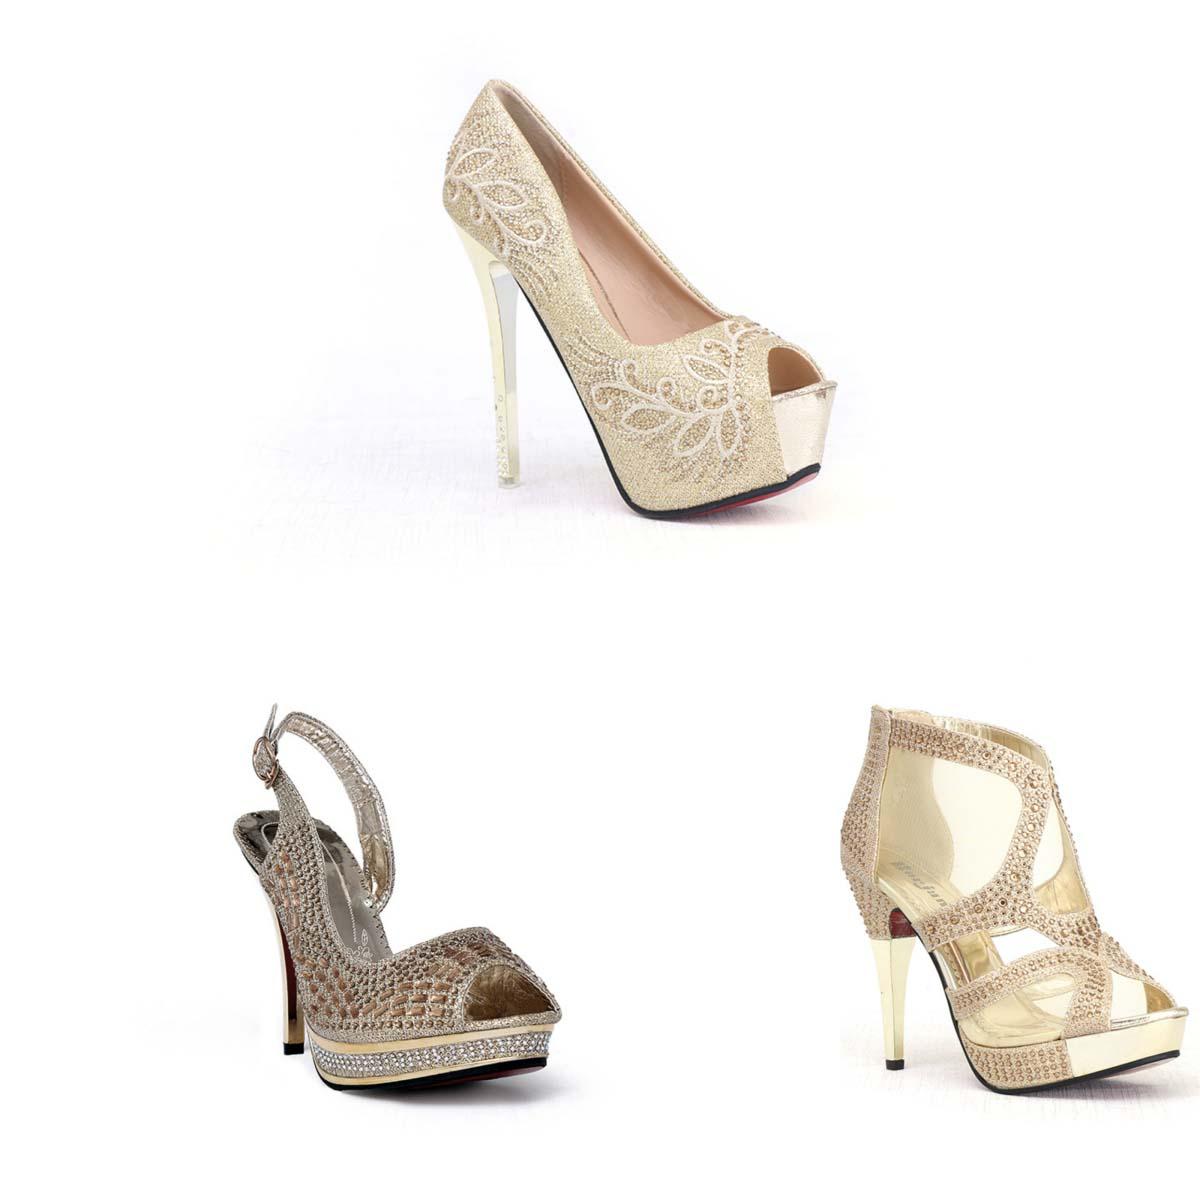 borjan-fancy-bridal-shoes-wedding-2017-2018-collection-7